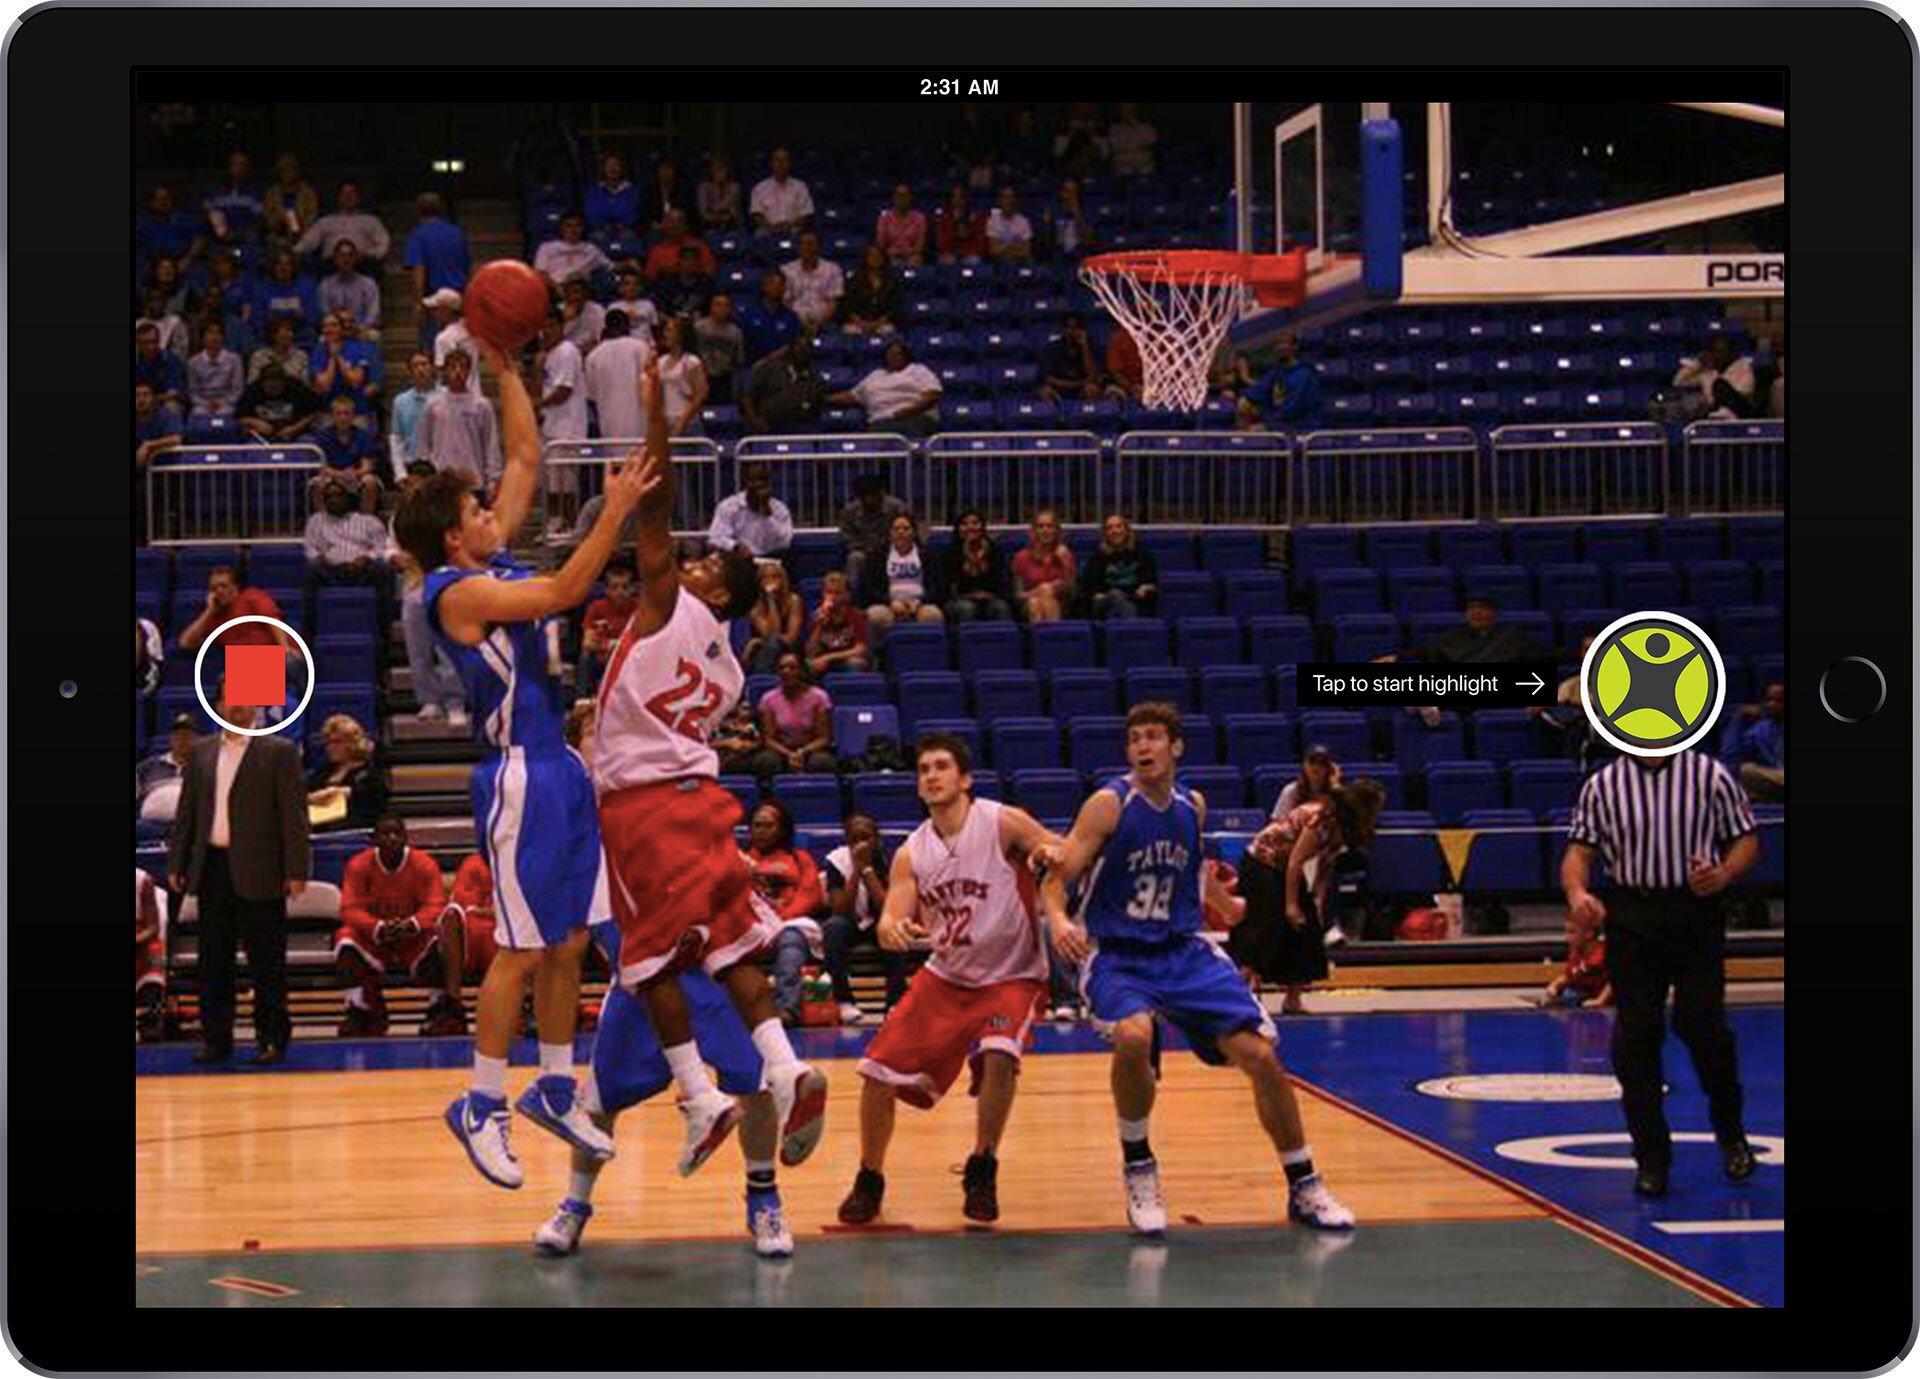 ScoreVision Capture App in Highlights Mode